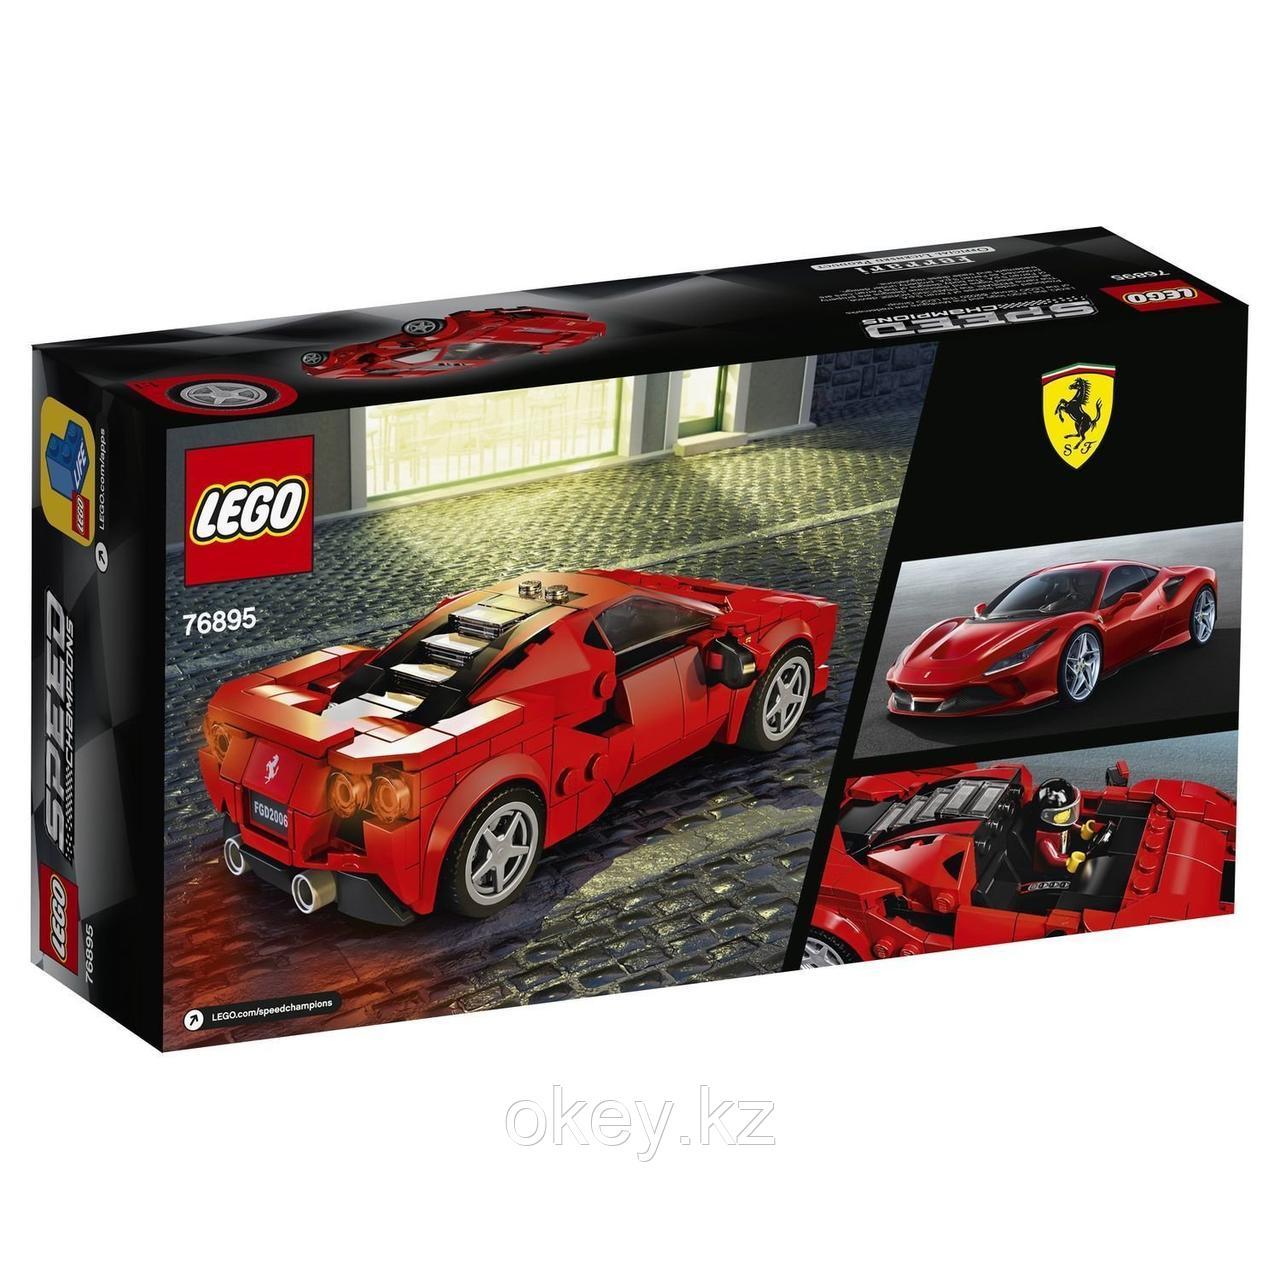 LEGO Speed Champions: Ferrari F8 Tributo 76895 - фото 2